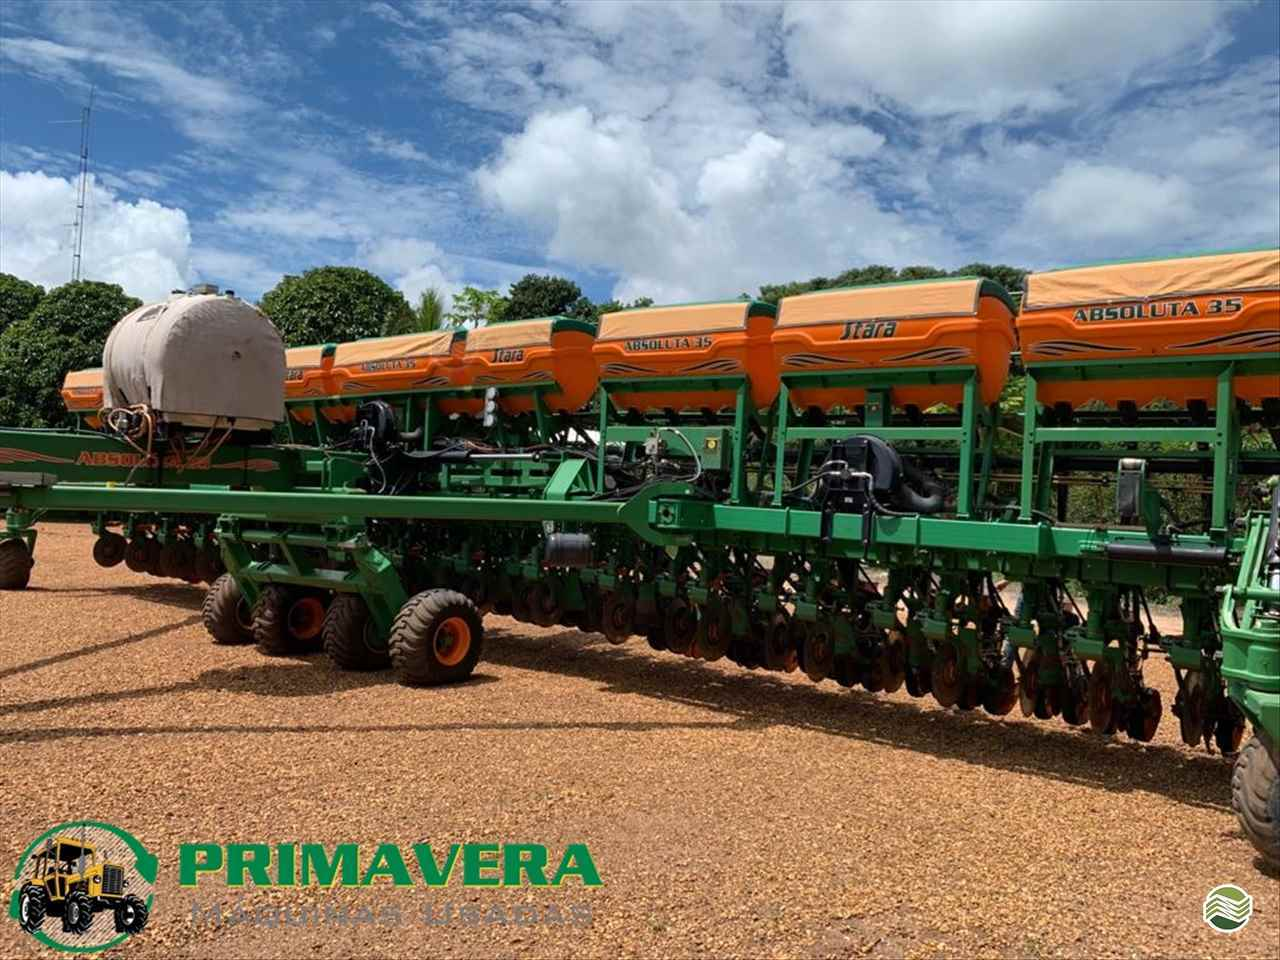 ABSOLUTA 35 de Primavera Máquinas Usadas - PRIMAVERA DO LESTE/MT